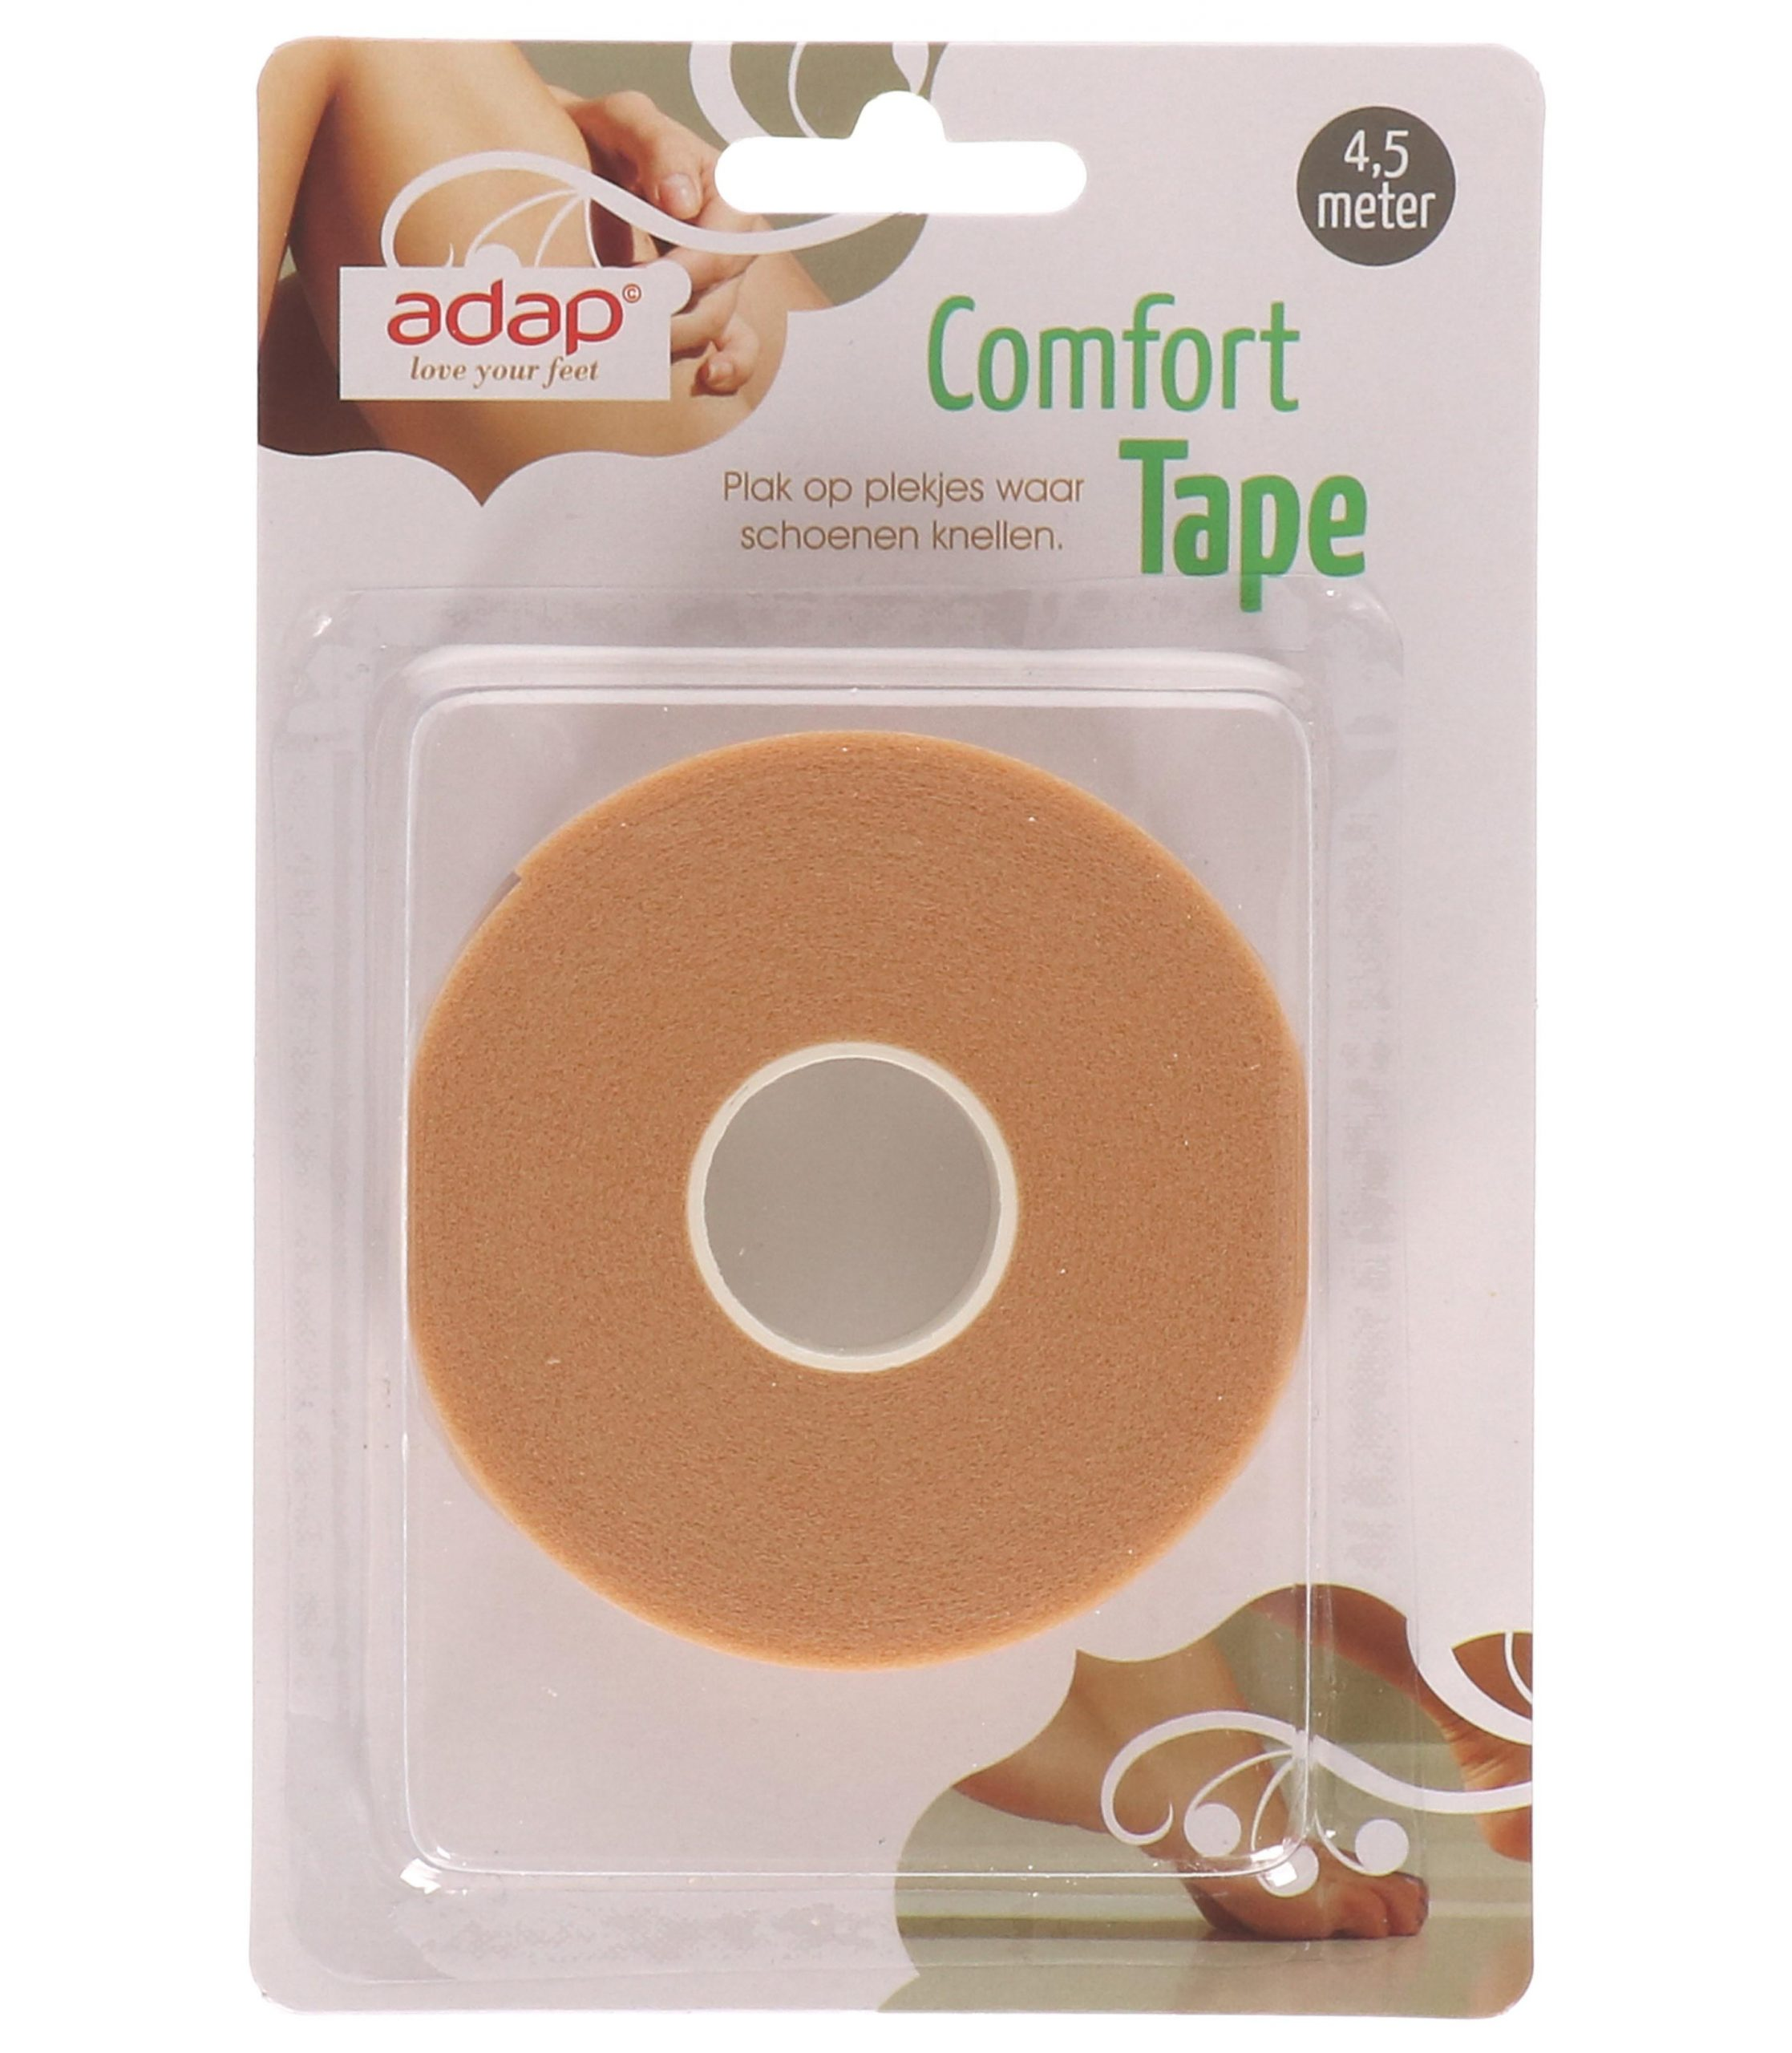 Comfort tape